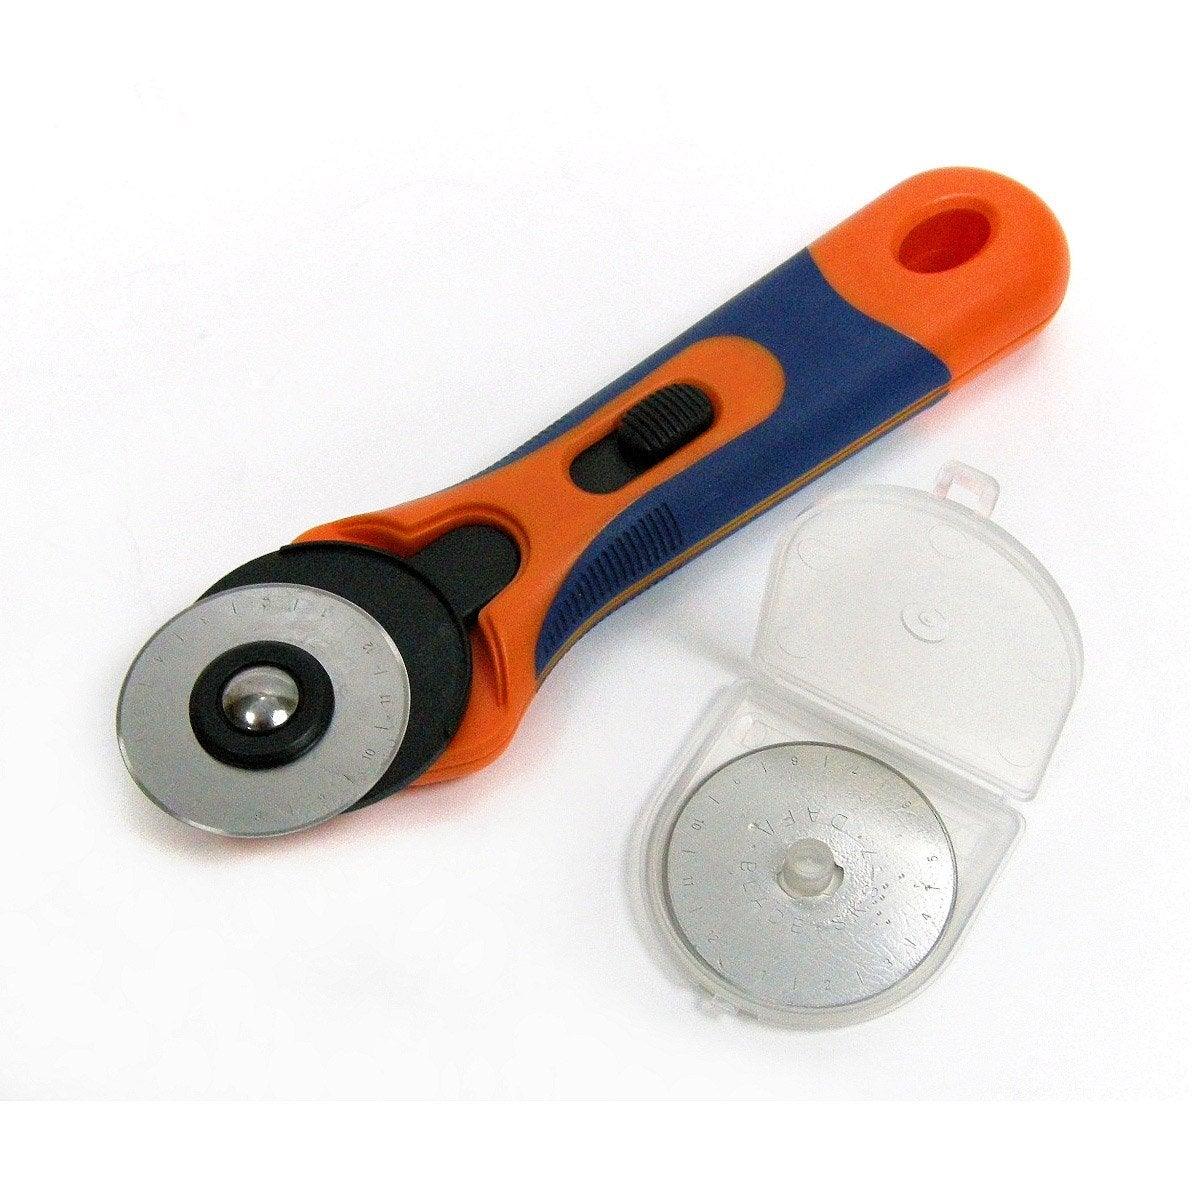 cutter rotatif 195 mm avec 2 lames dexter leroy merlin. Black Bedroom Furniture Sets. Home Design Ideas